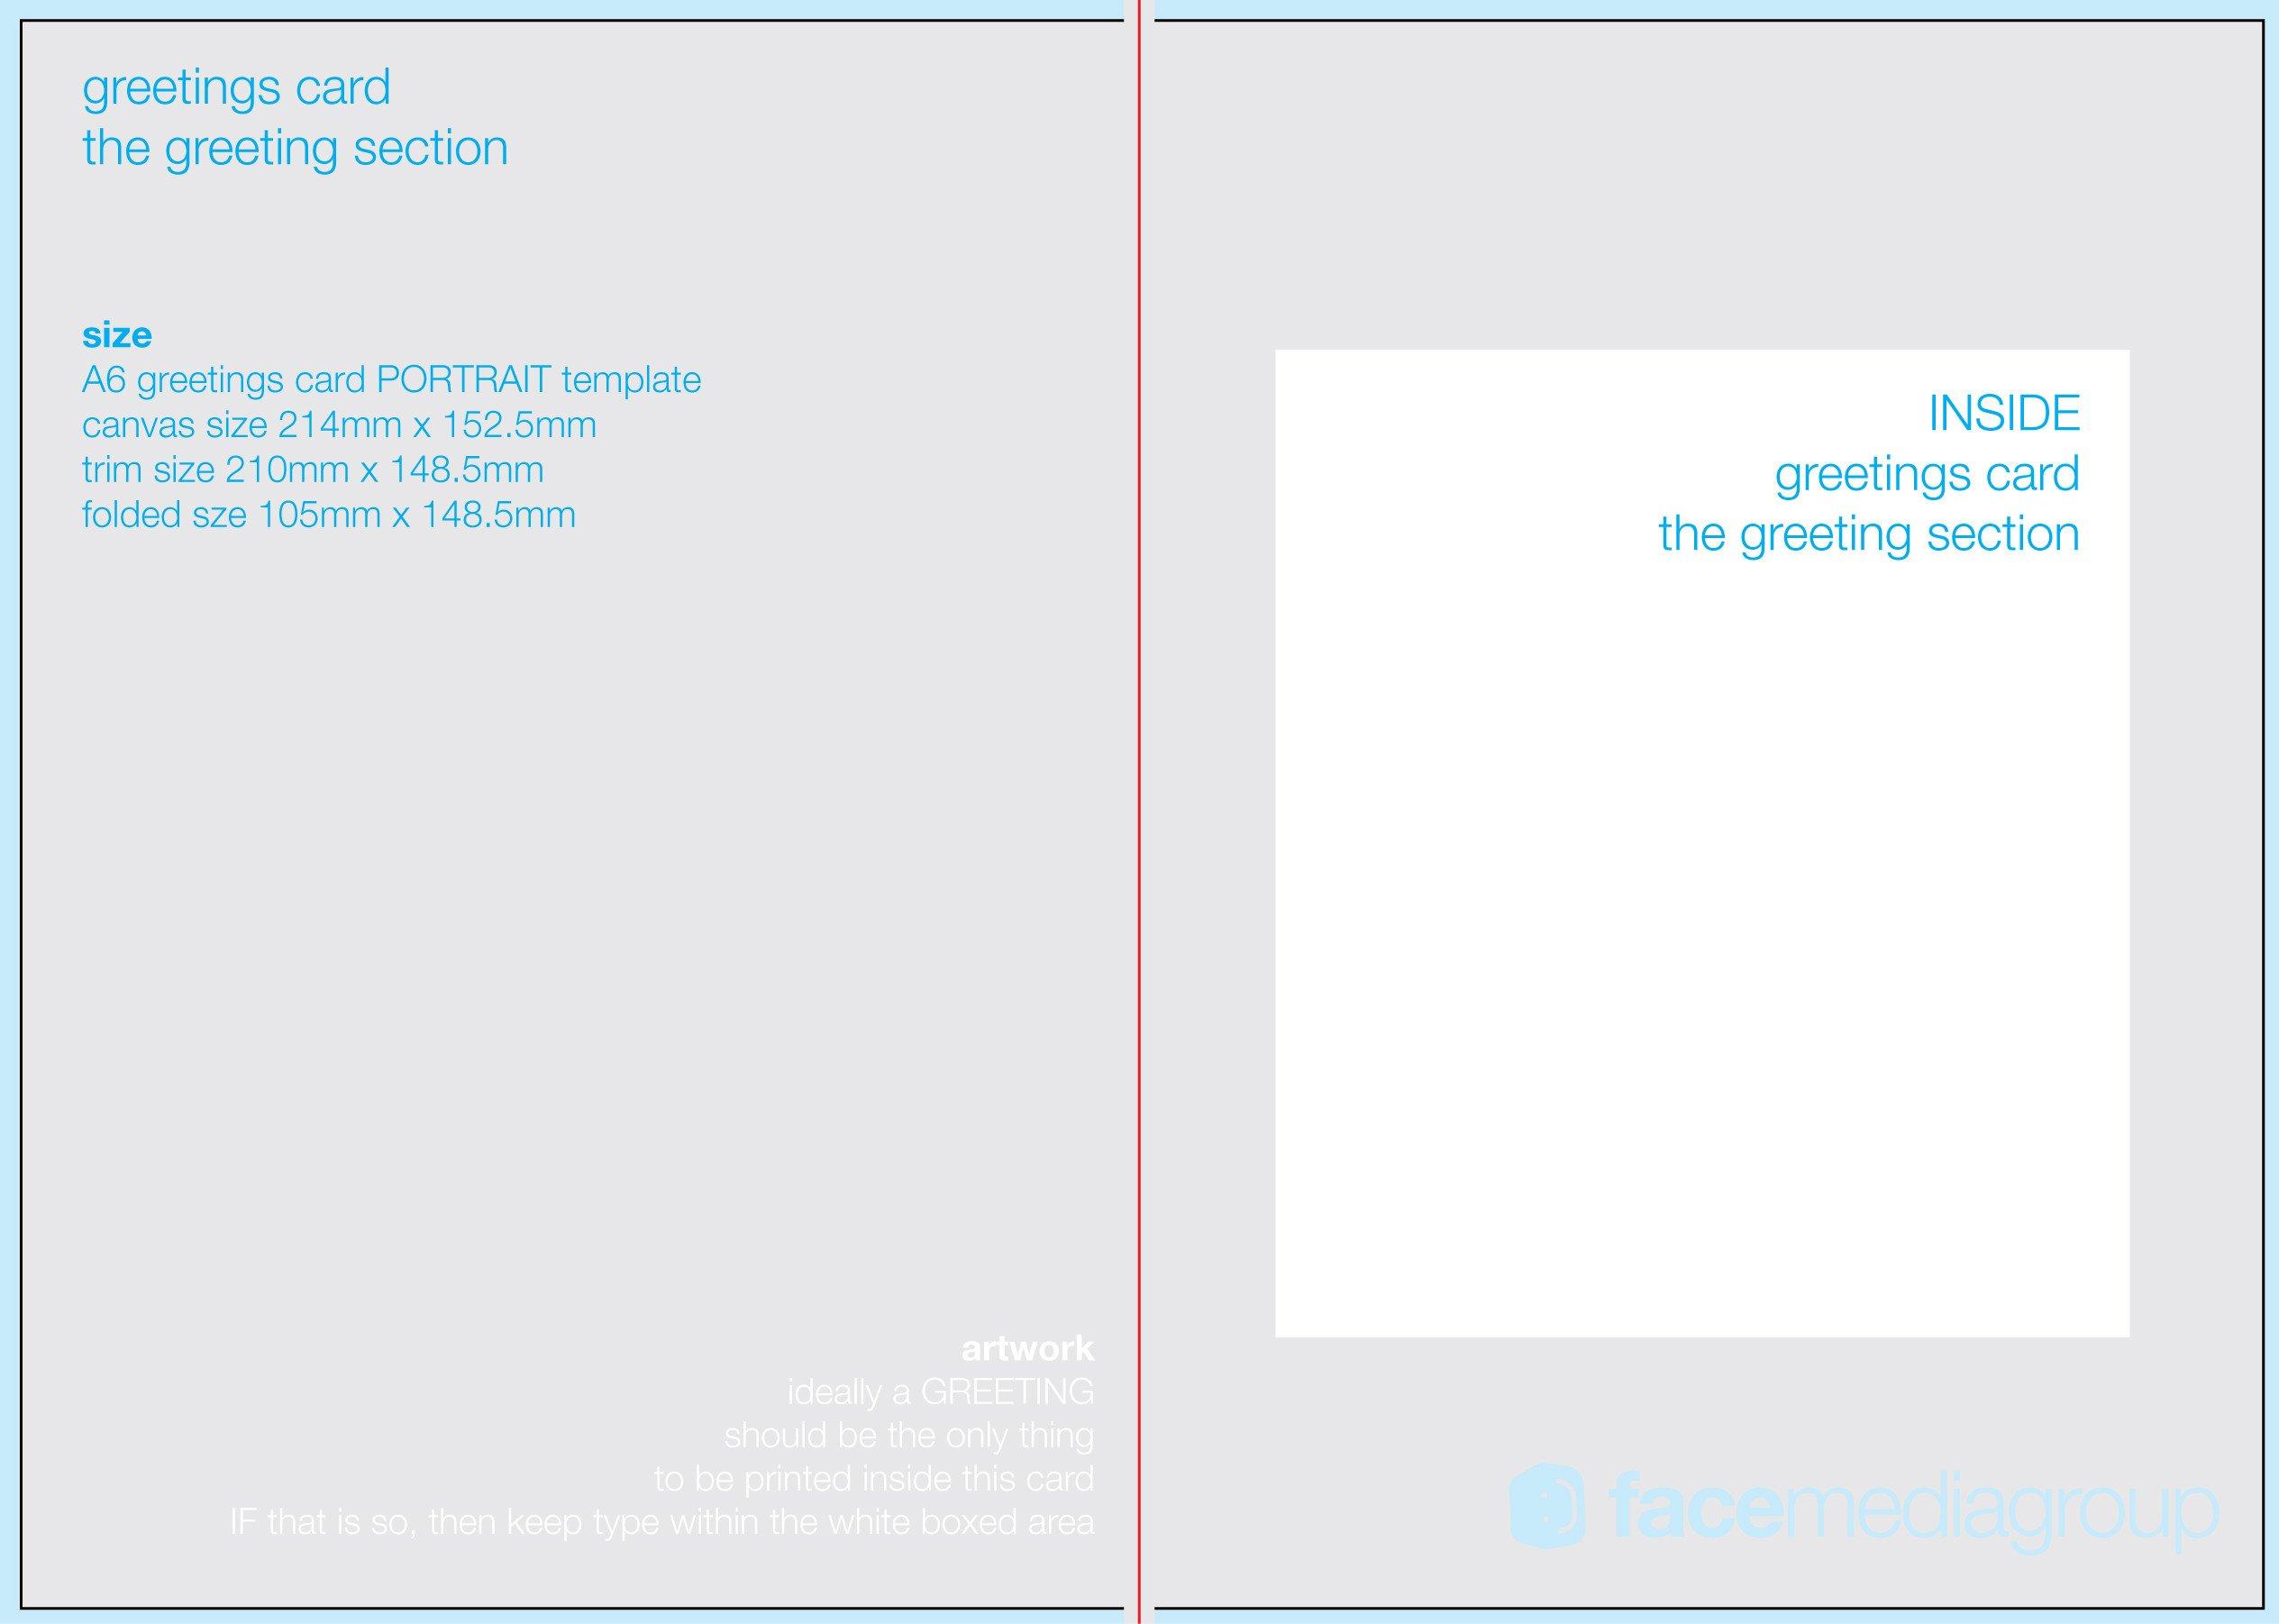 Printable Greetings Cards Templates Free Blank Greetings Card Artwork Templates for Download